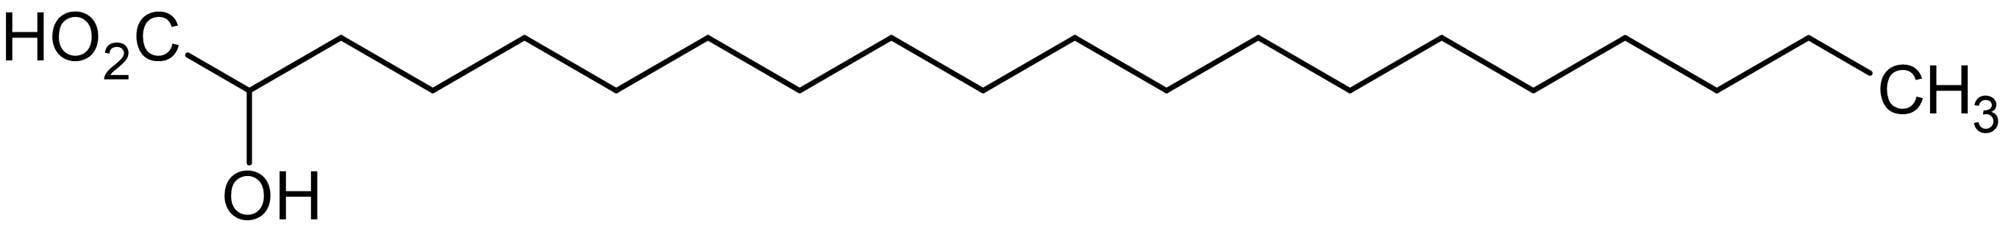 Chemical Structure - 2-Hydroxyeicosanoic acid, 2-Hydroxy C20:0 fatty acid (ab144012)